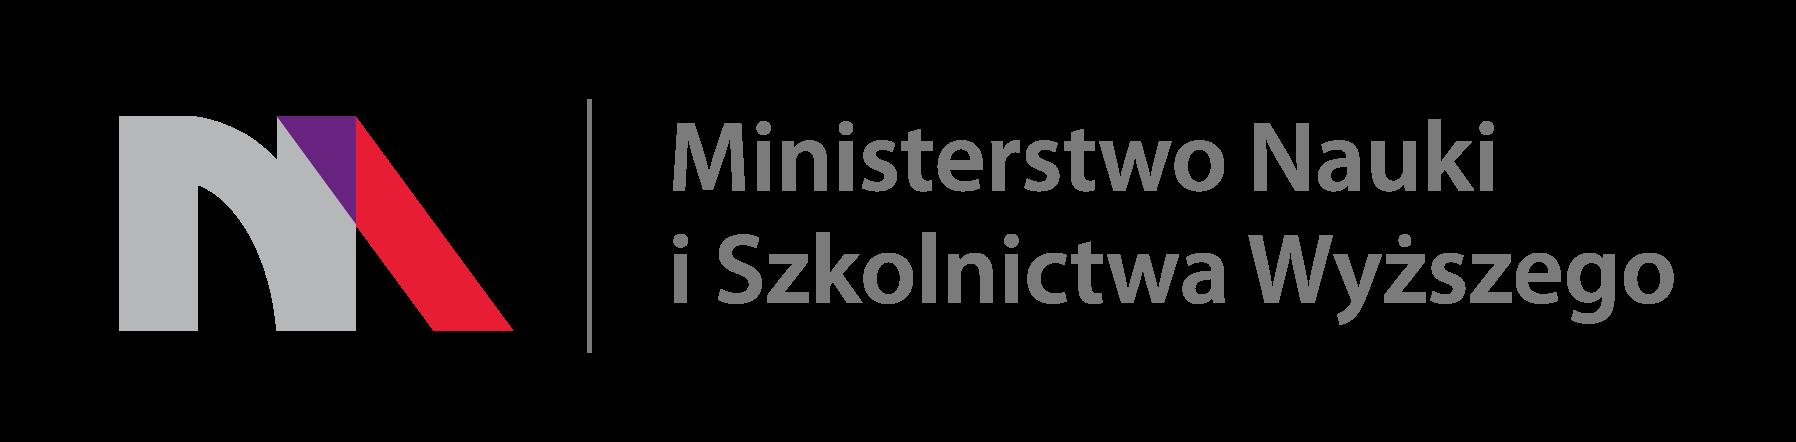 Logo Ministerstwa Nauki